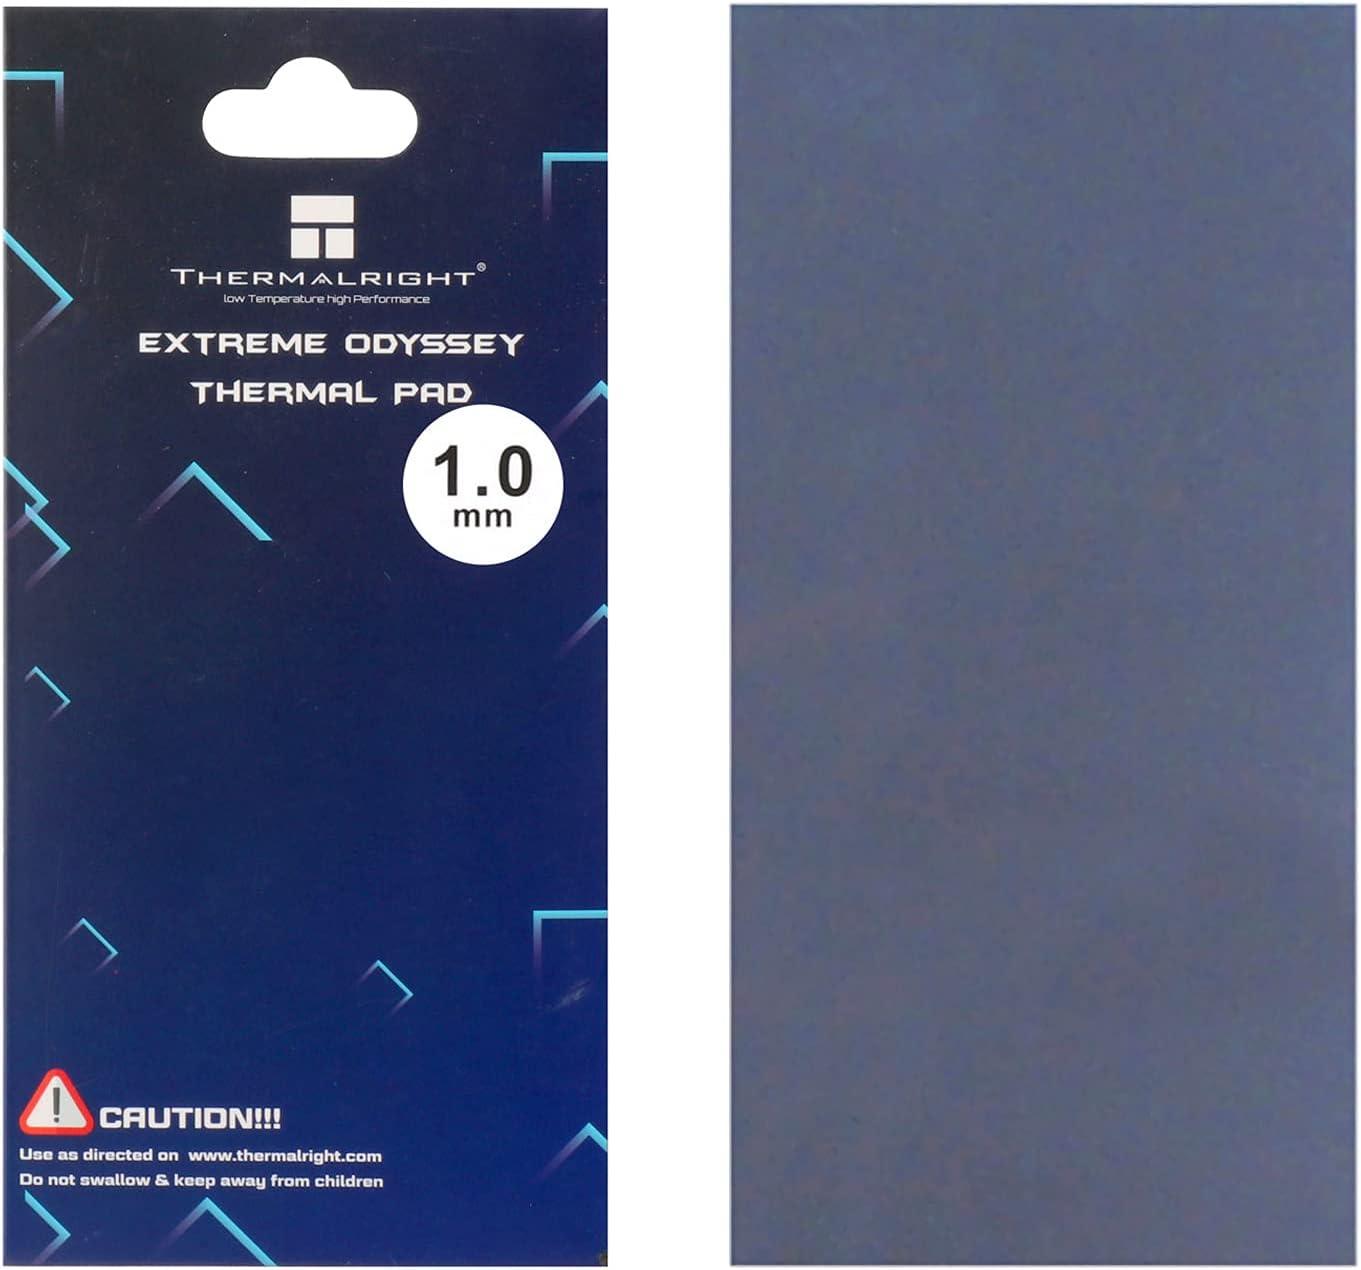 WENDU Thermalright Thermal Pad 12.8 W/mK, 85x45x1.0mm, Non Conductive Heat Resistance High Temperature Resistance, Silicone Thermal Pads for Laptop Heatsink/GPU/CPU/LED Cooler(1.0mm)